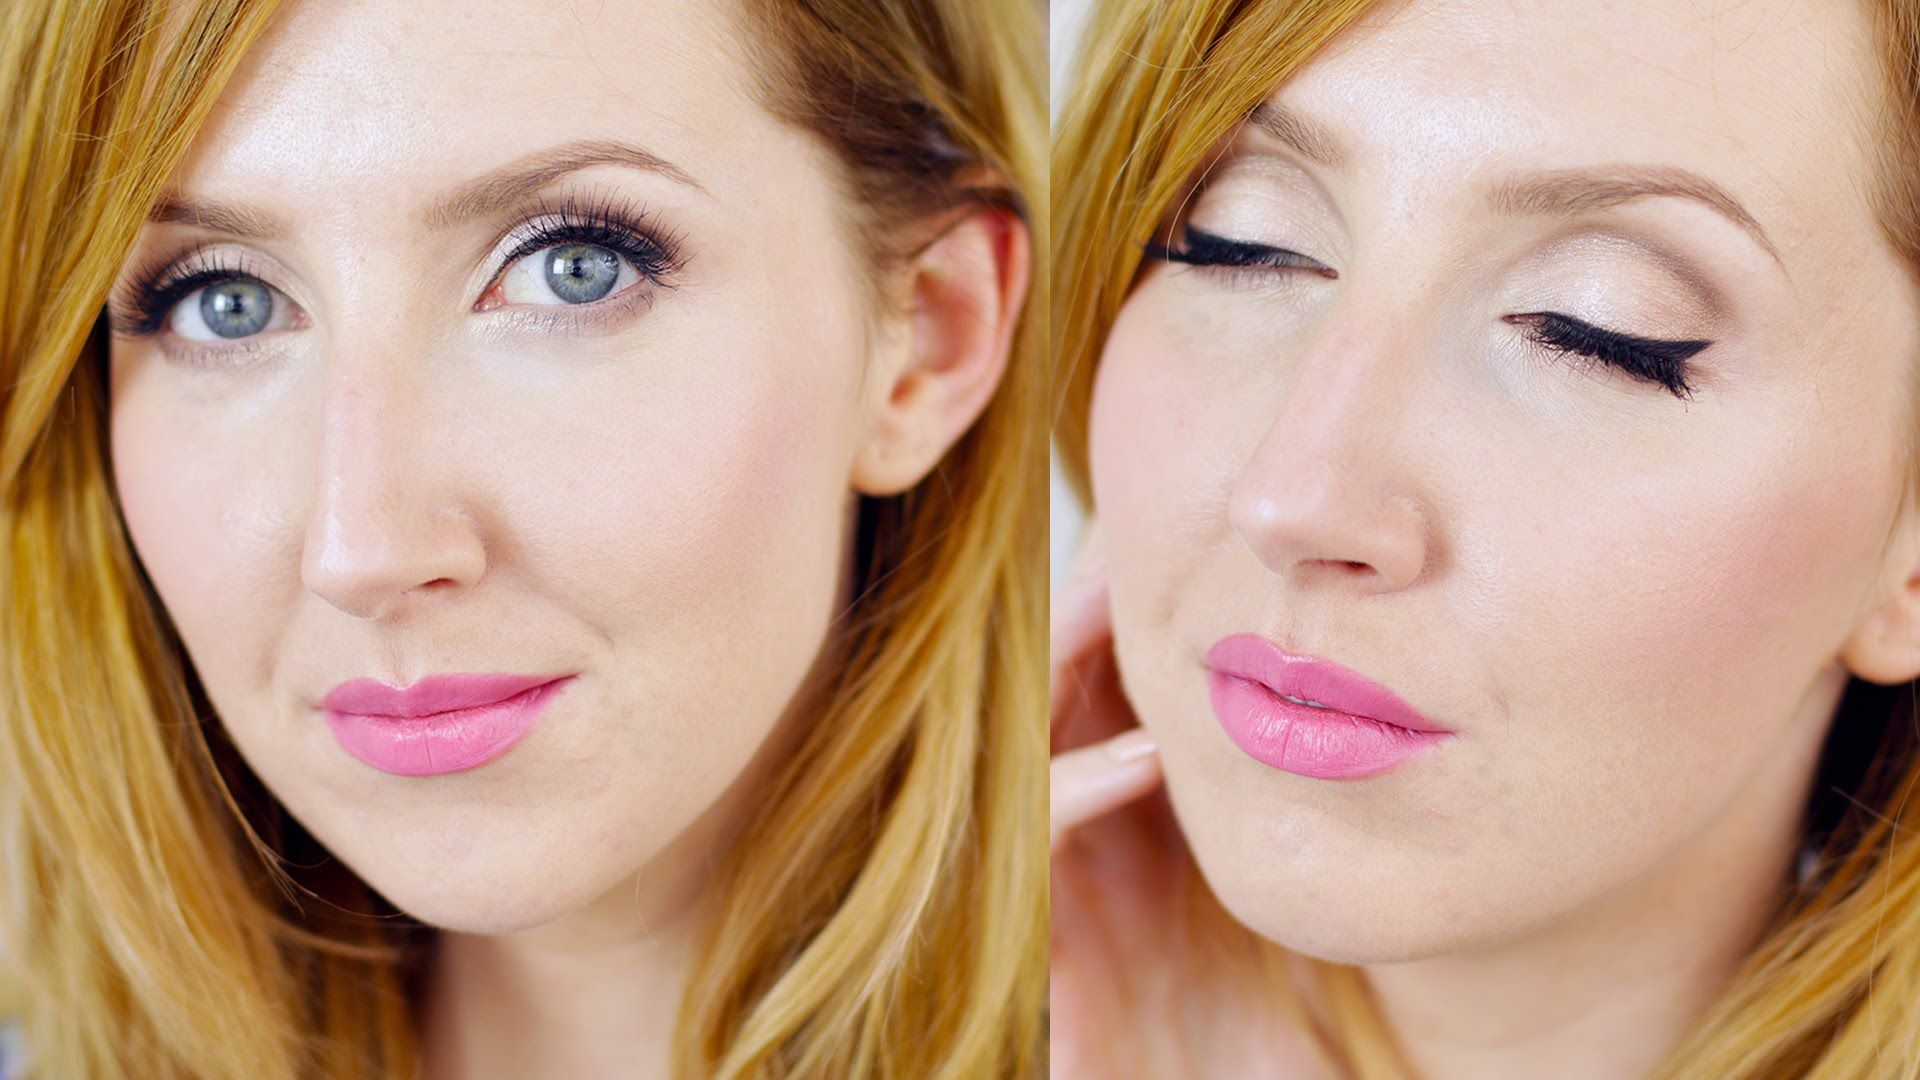 Ellie Goulding Fresh and Pretty Makeup Tutorial Pretty